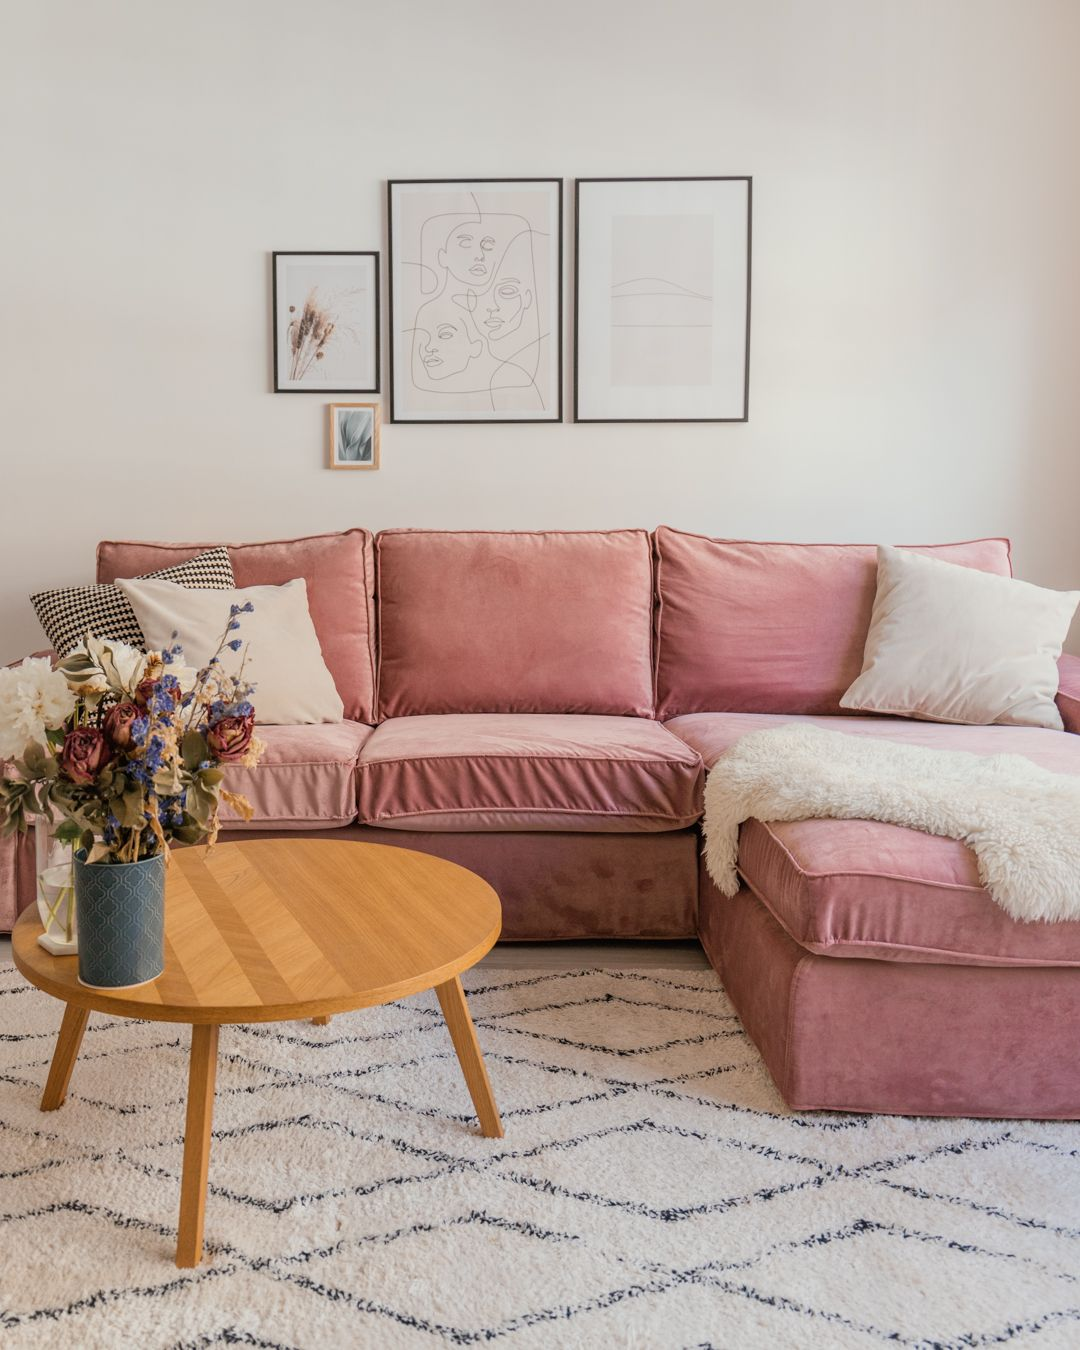 Ikea Kivik Sofa Cover In Velvet Pink